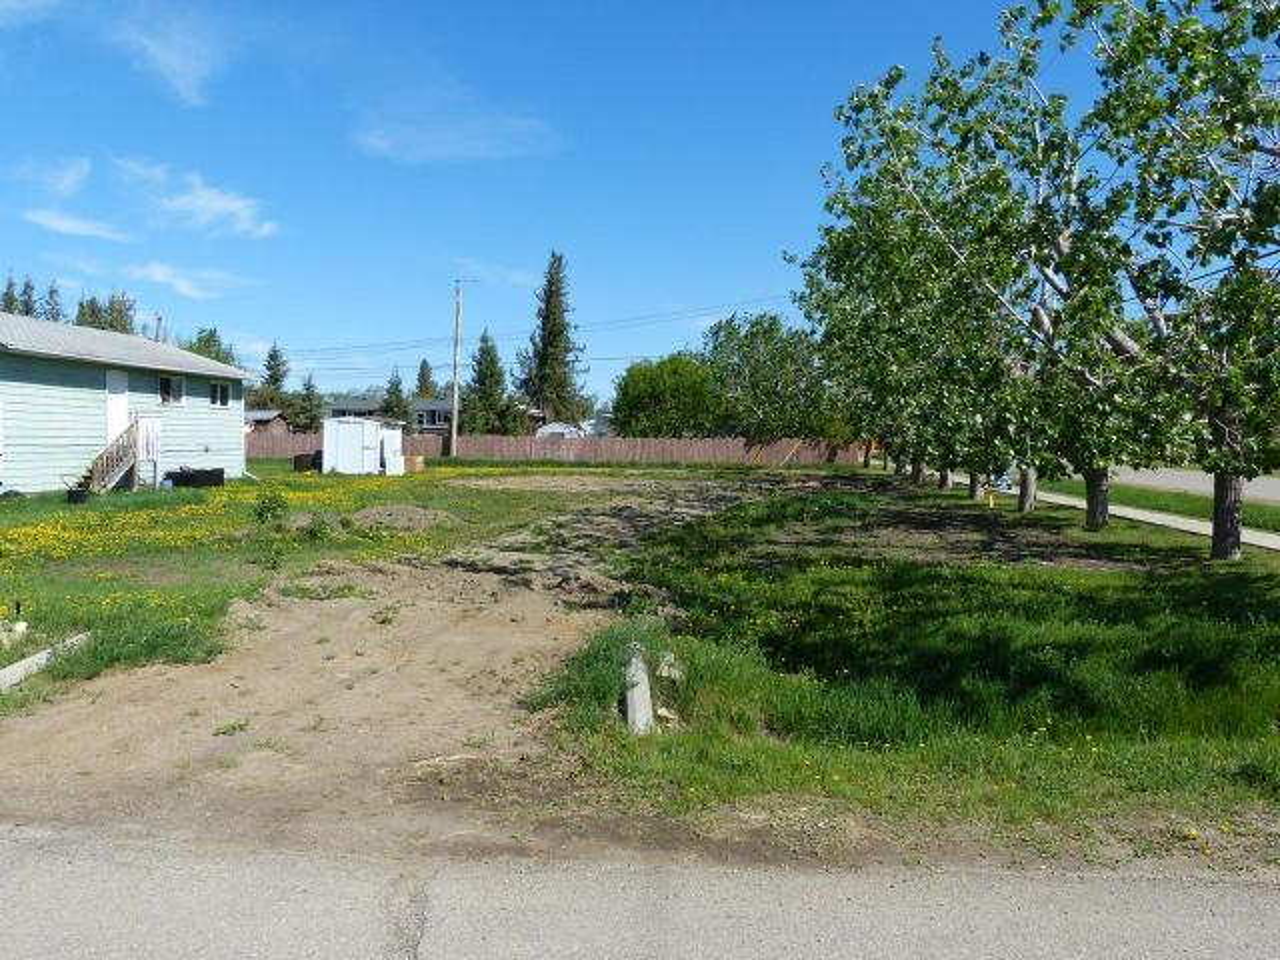 4926 49 Avenue,, Pouce Coupe, British Columbia  V0C 2C0 - Photo 2 - 169570